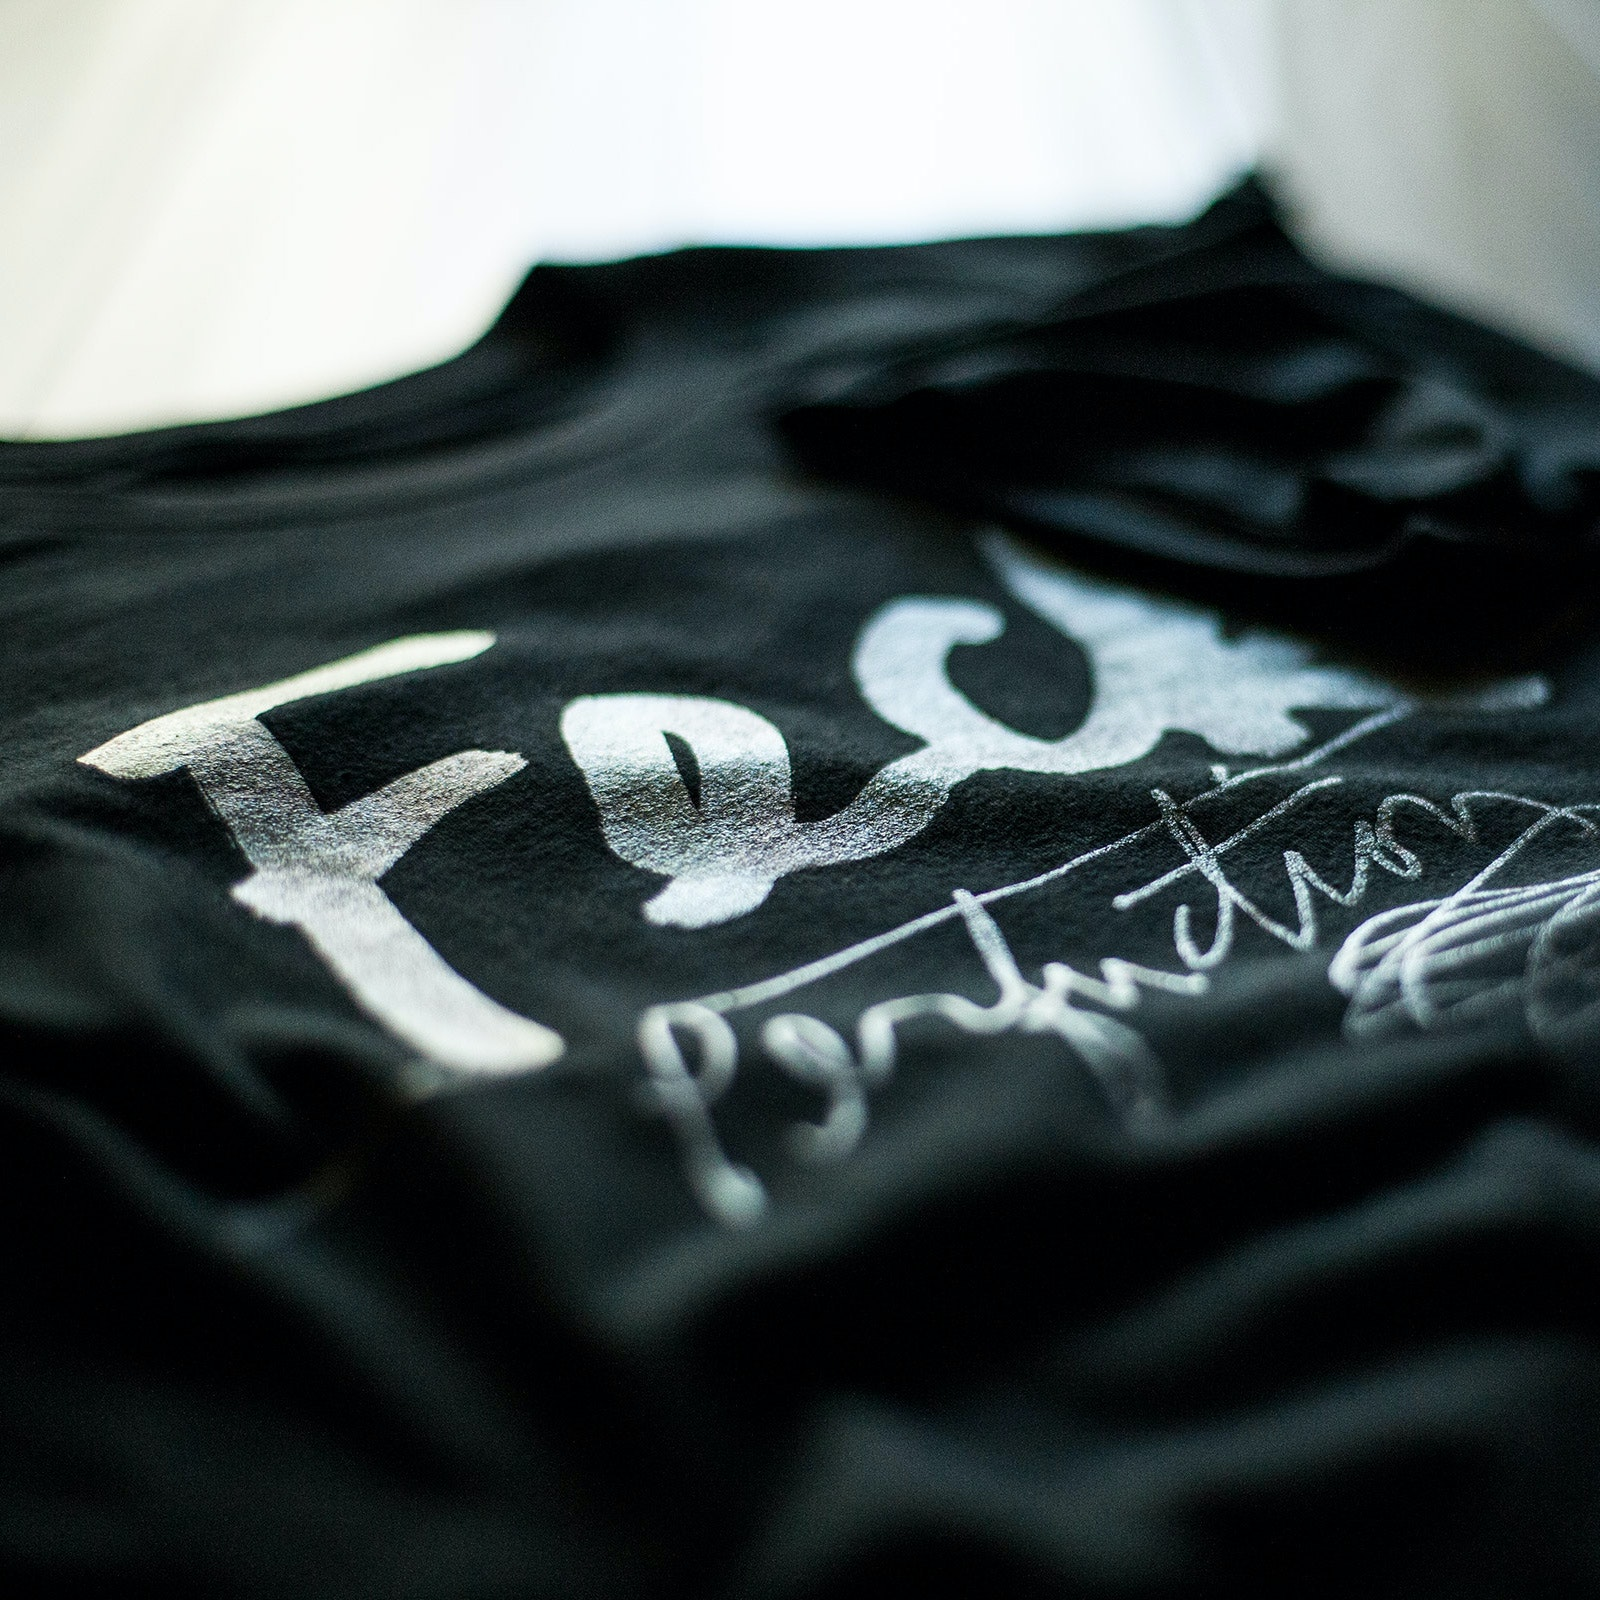 Feck Perfuction - Black Friday